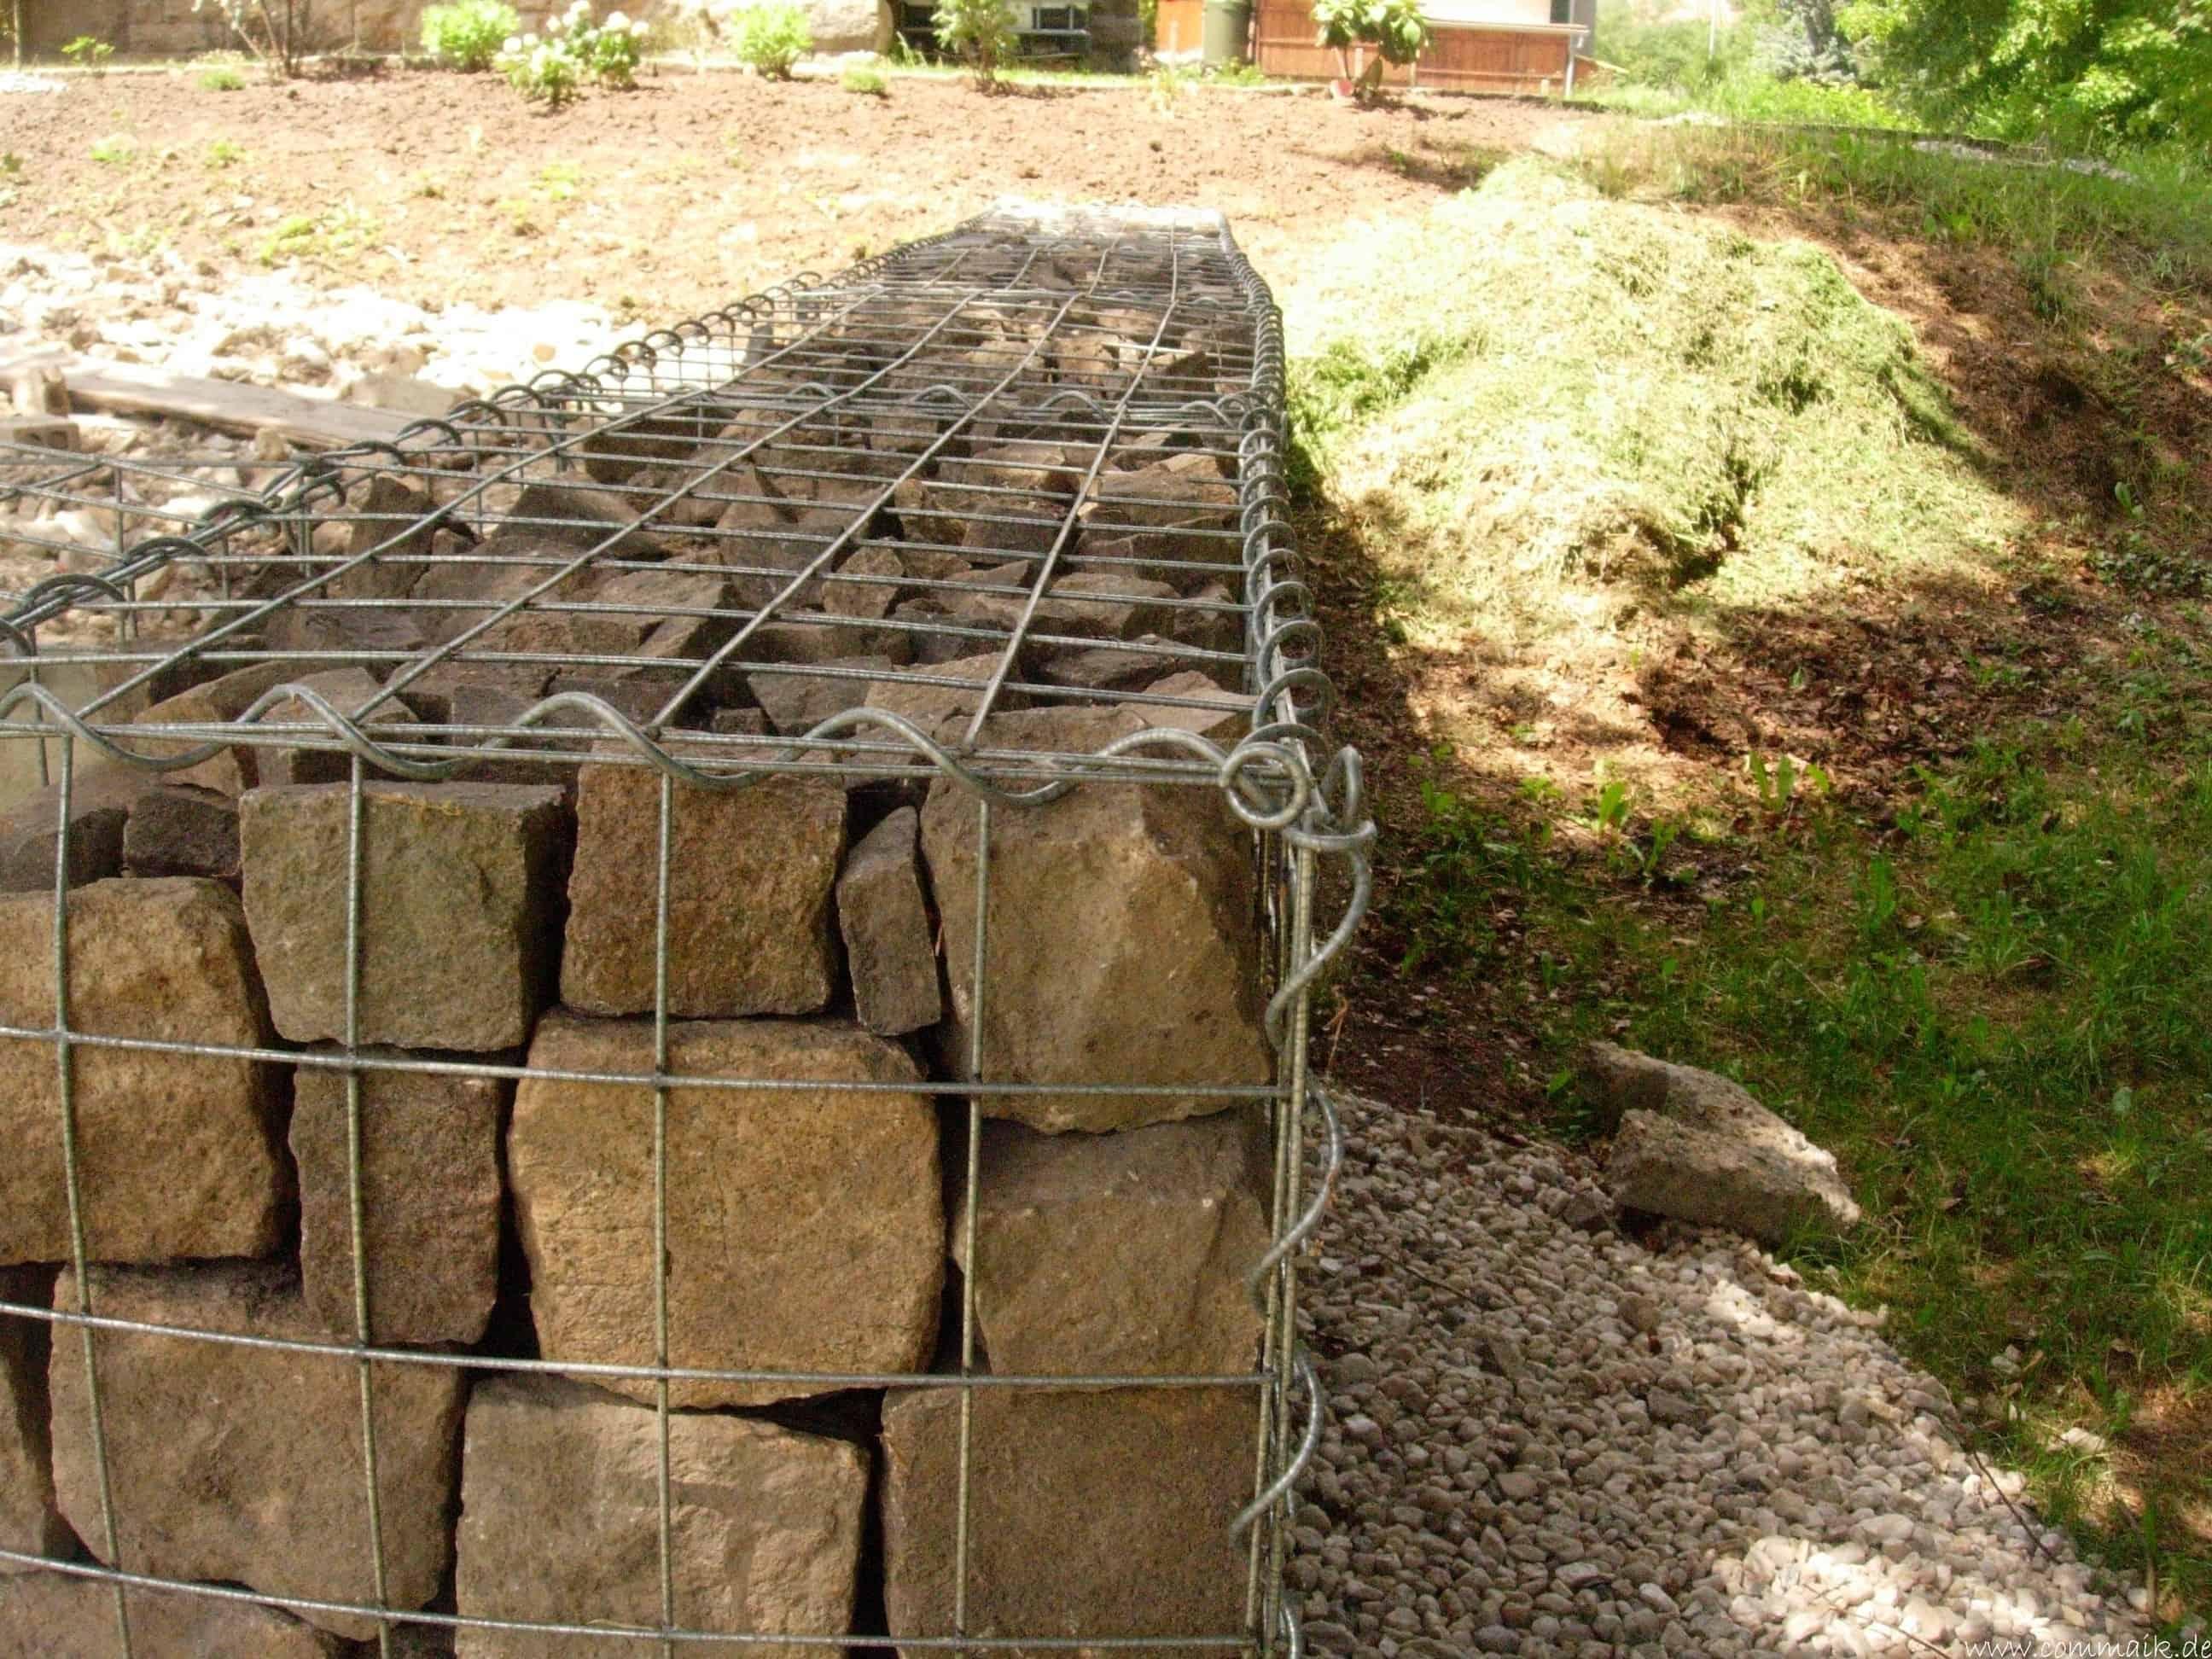 Fabulous Der Bau unserer Gabionen Terrasse zum Abfang des Hangs | commaik JF66